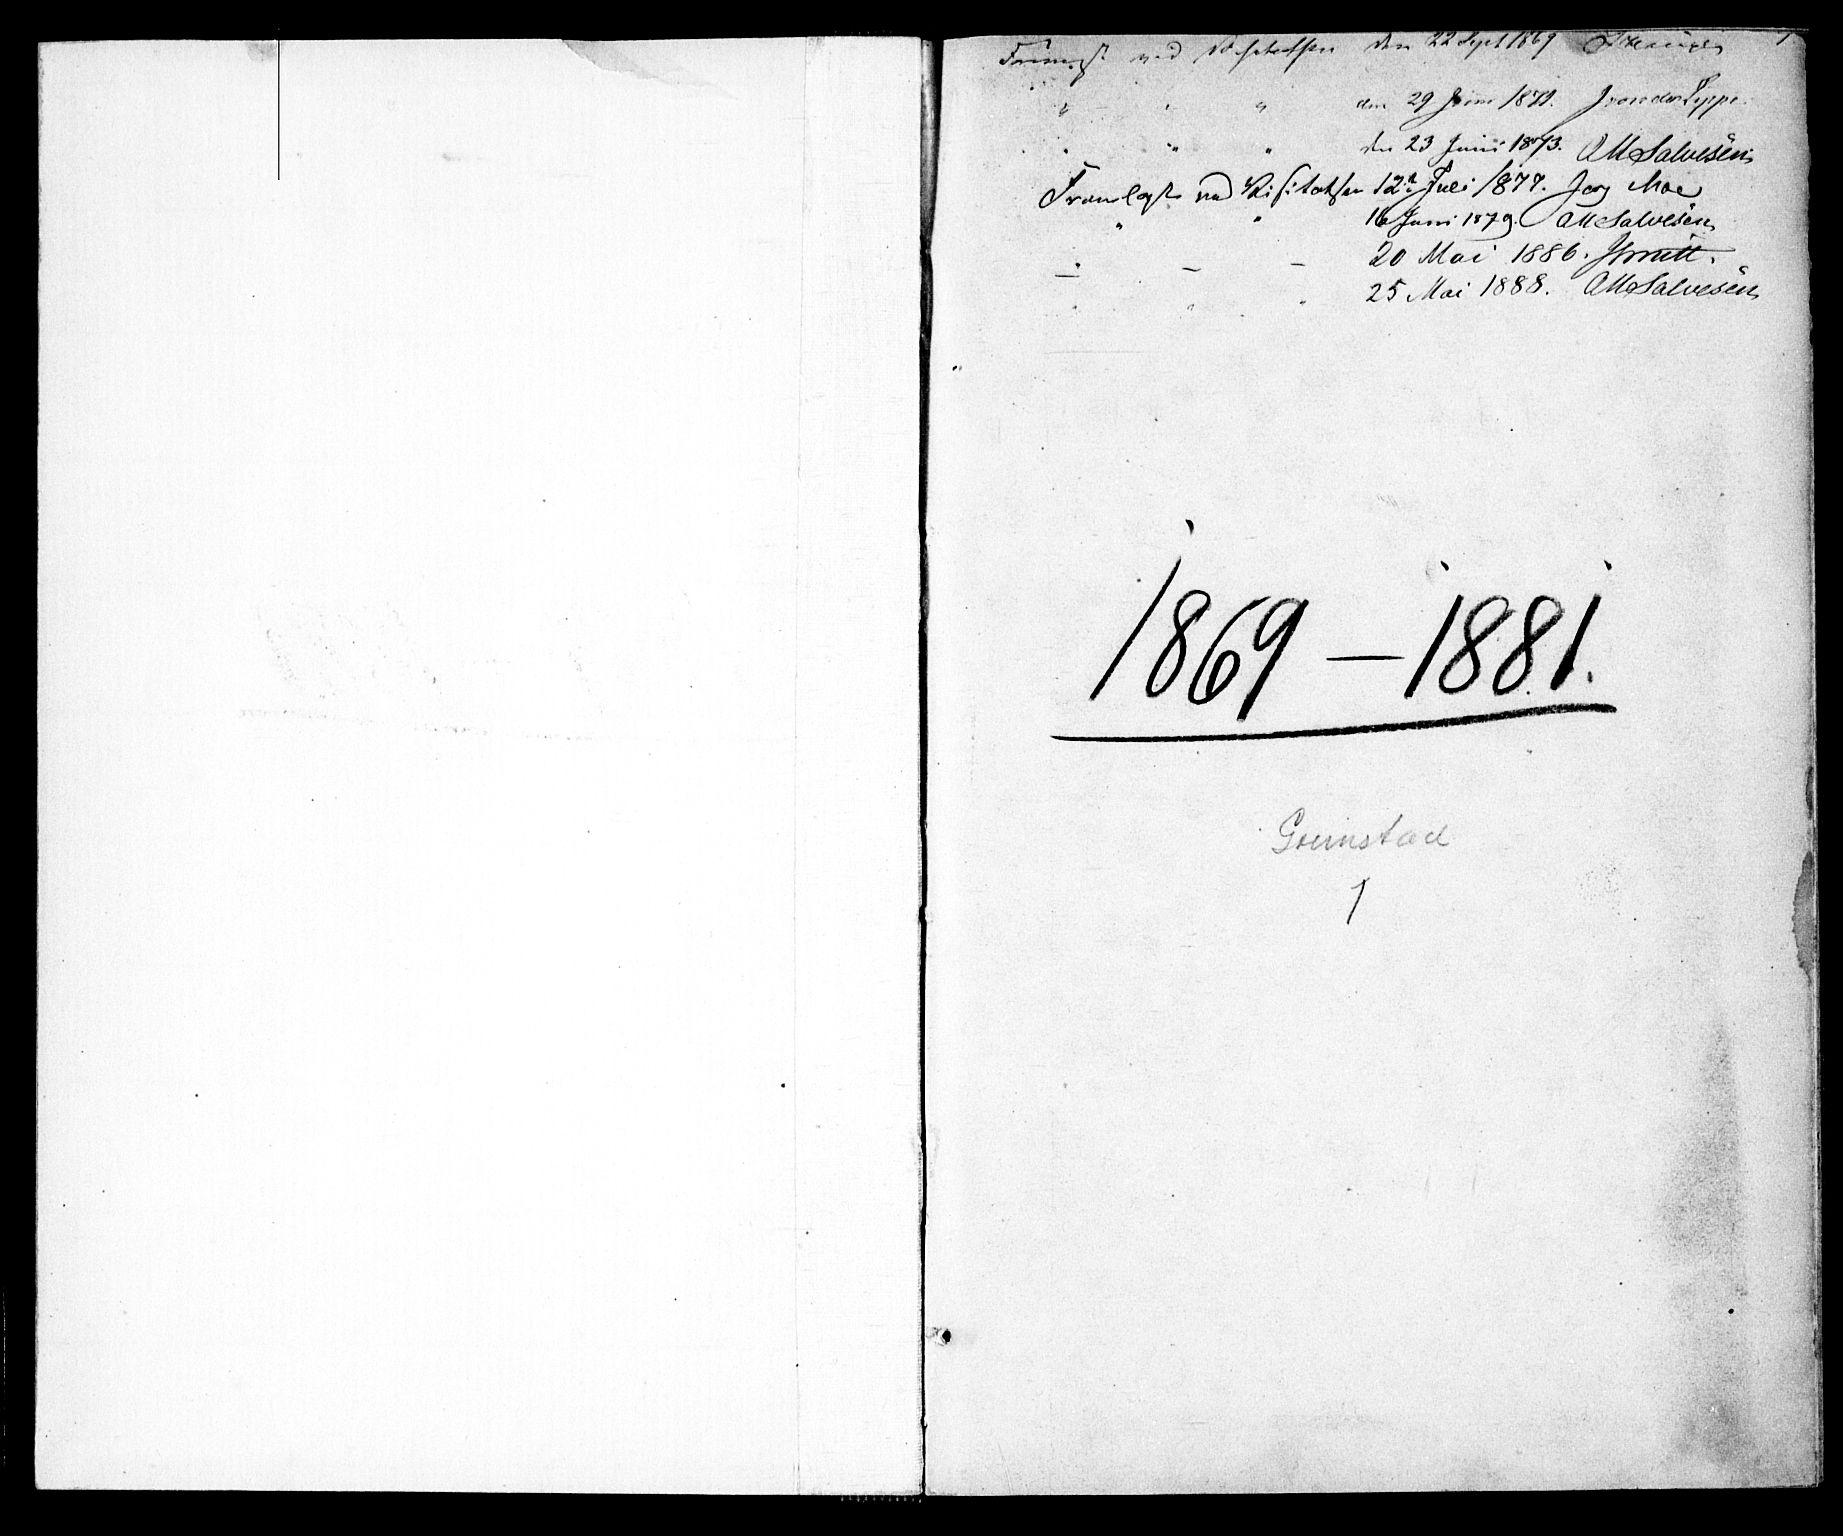 SAK, Grimstad sokneprestkontor, F/Fa/L0002: Ministerialbok nr. A 1, 1869-1881